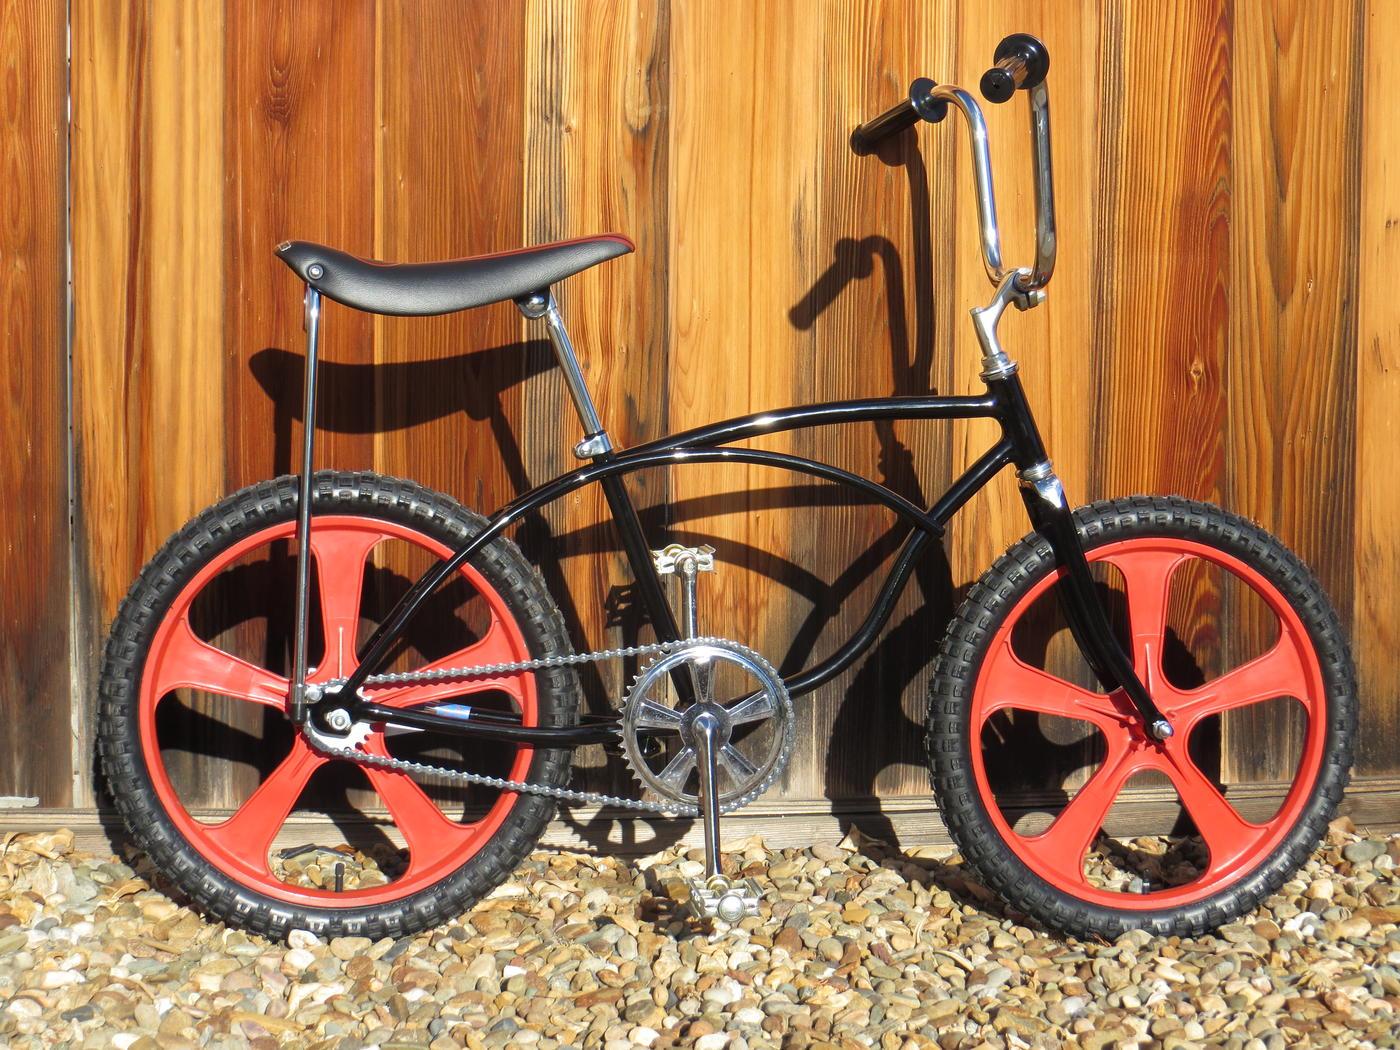 2 Seater Schwinn Bike Parts : Schwinn stingray deluxe bmxmuseum